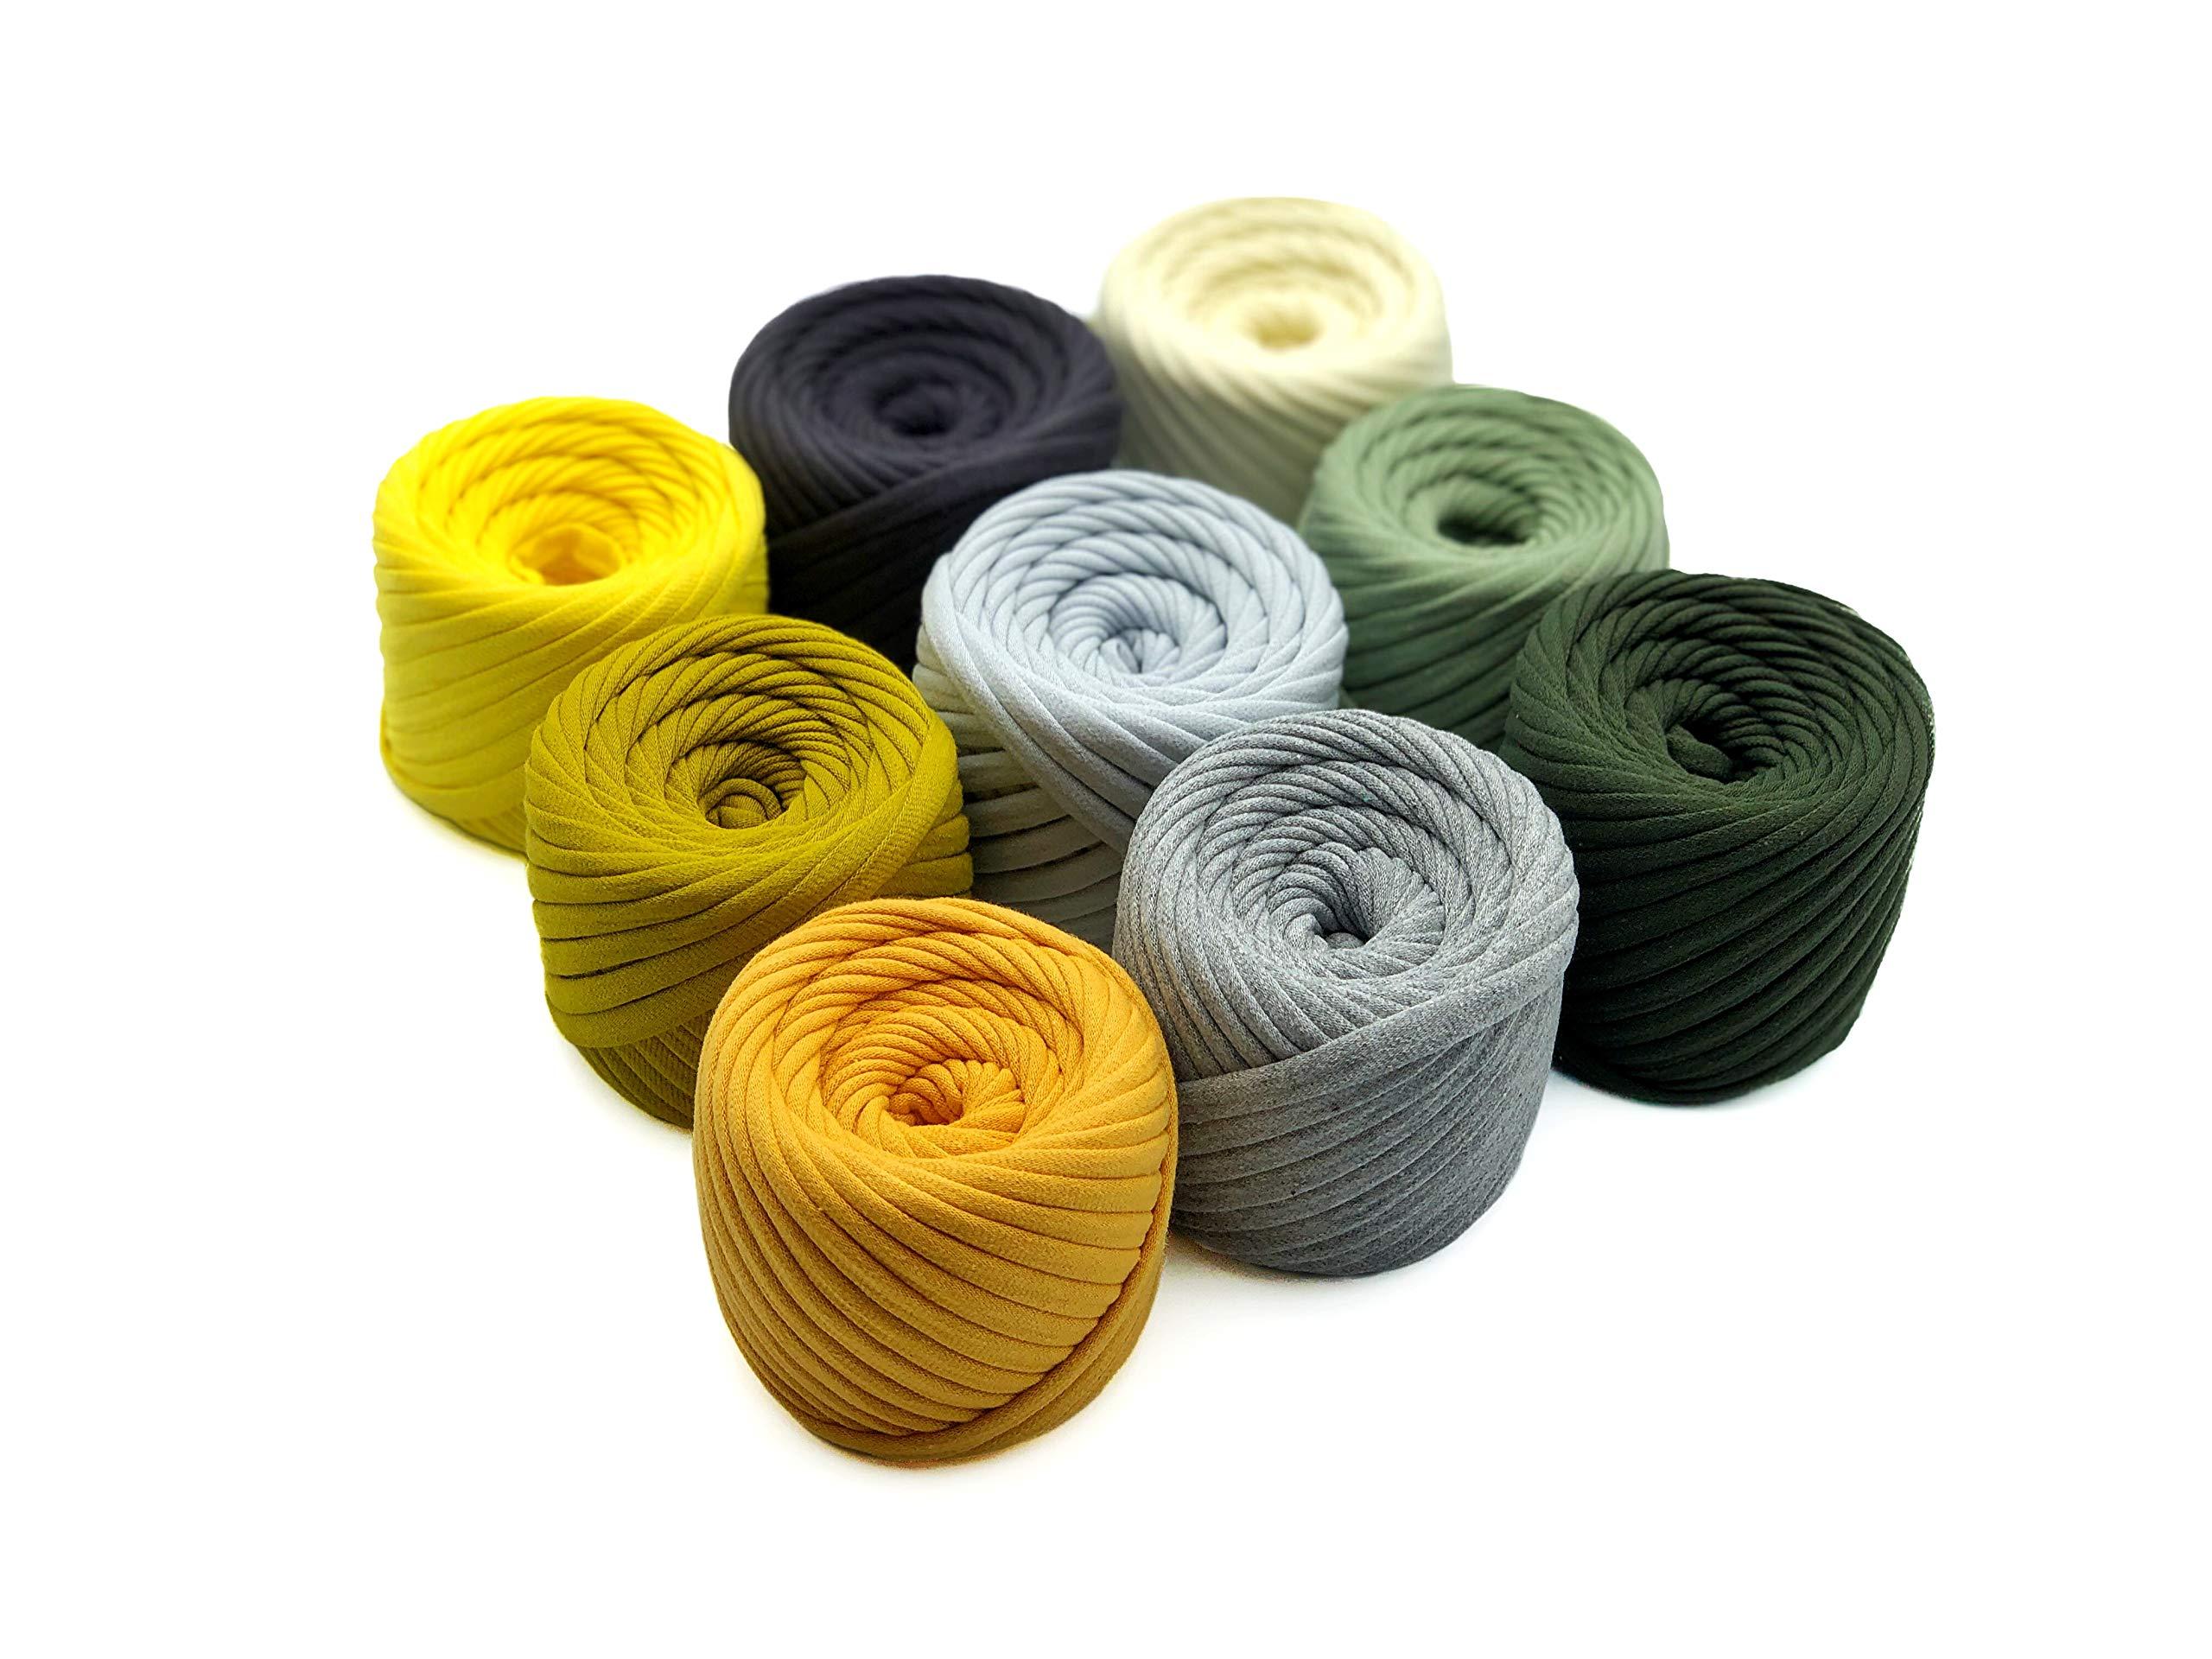 T-Shirt Yarn Fettuccini Zpagetti Set - 9 Balls Total of 196 Yards - Tshirt Yarn Kit for Crocheting - Ribbon Yarn 100% Cotton - Knitting Yarn Ball - T Yarn Organic - T-Yarn Angelina Set